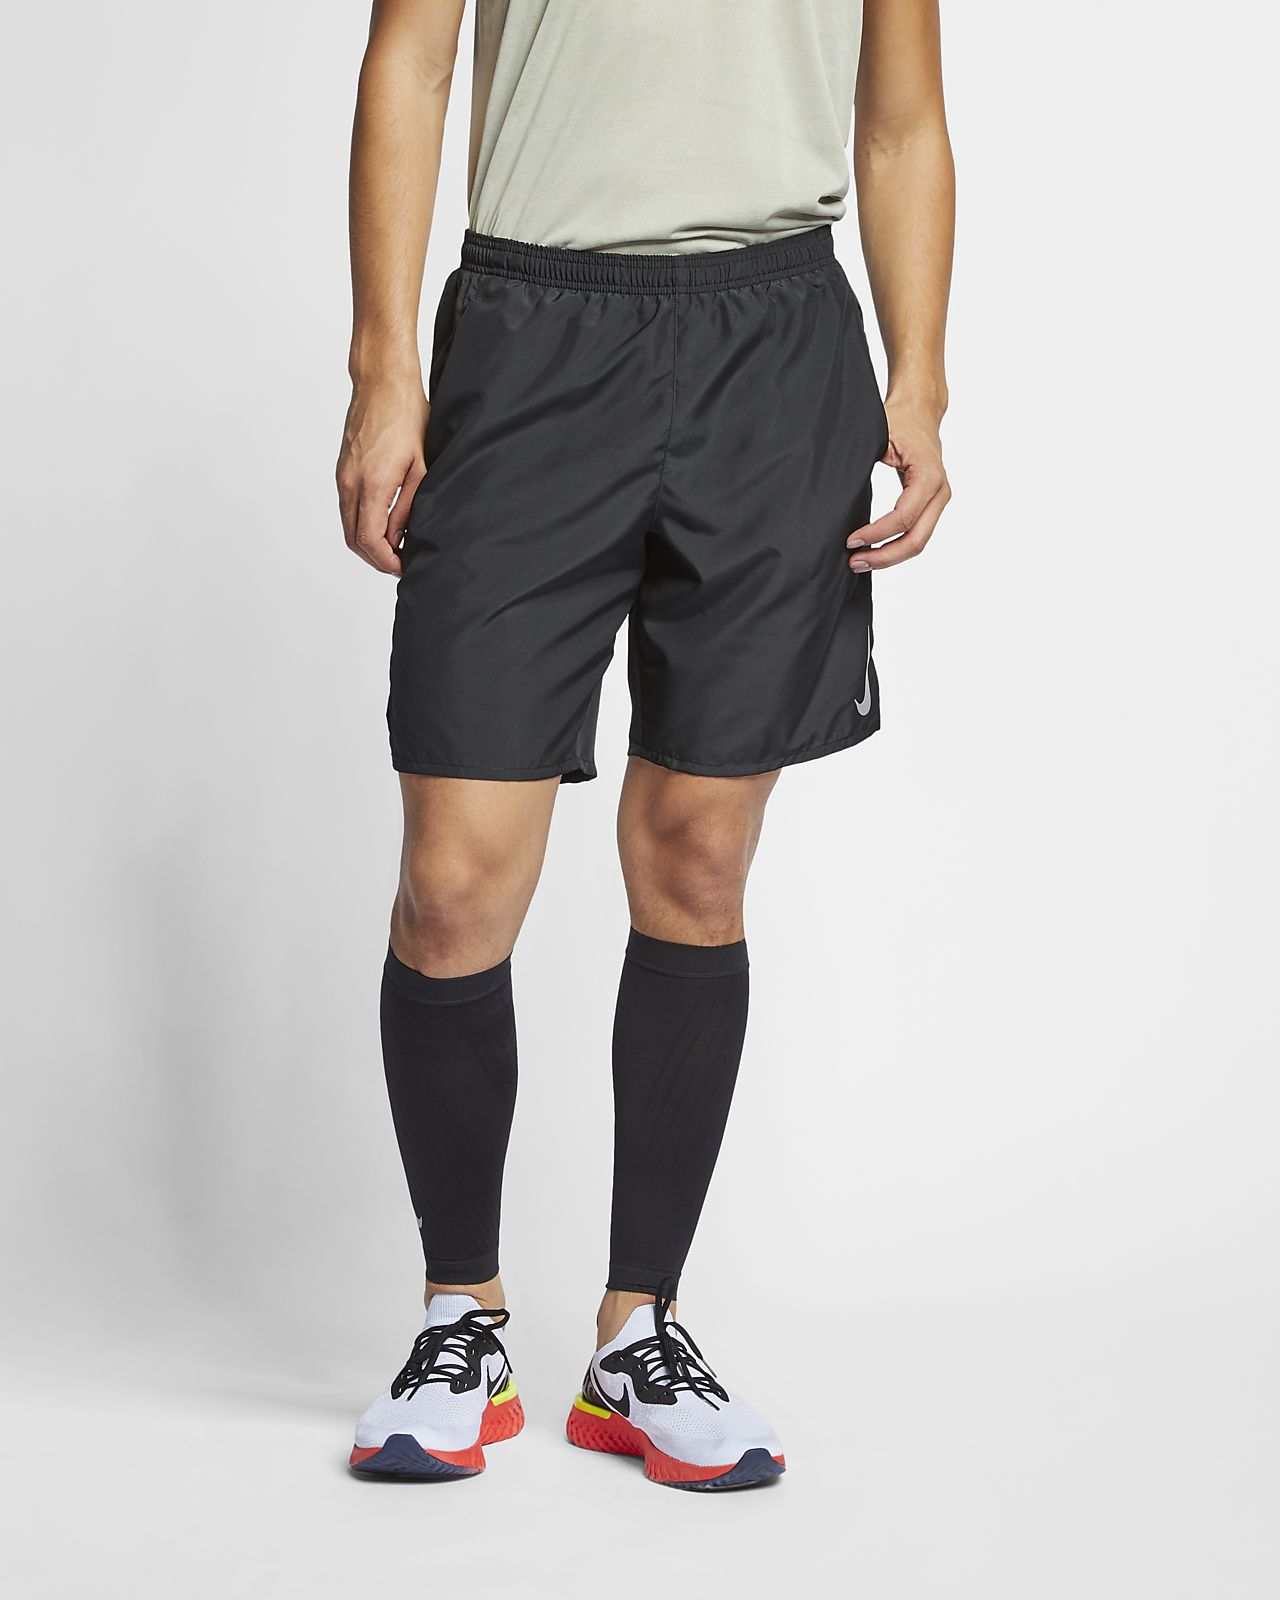 29066f89956f Nike Challenger Men's Running Shorts. Nike.com